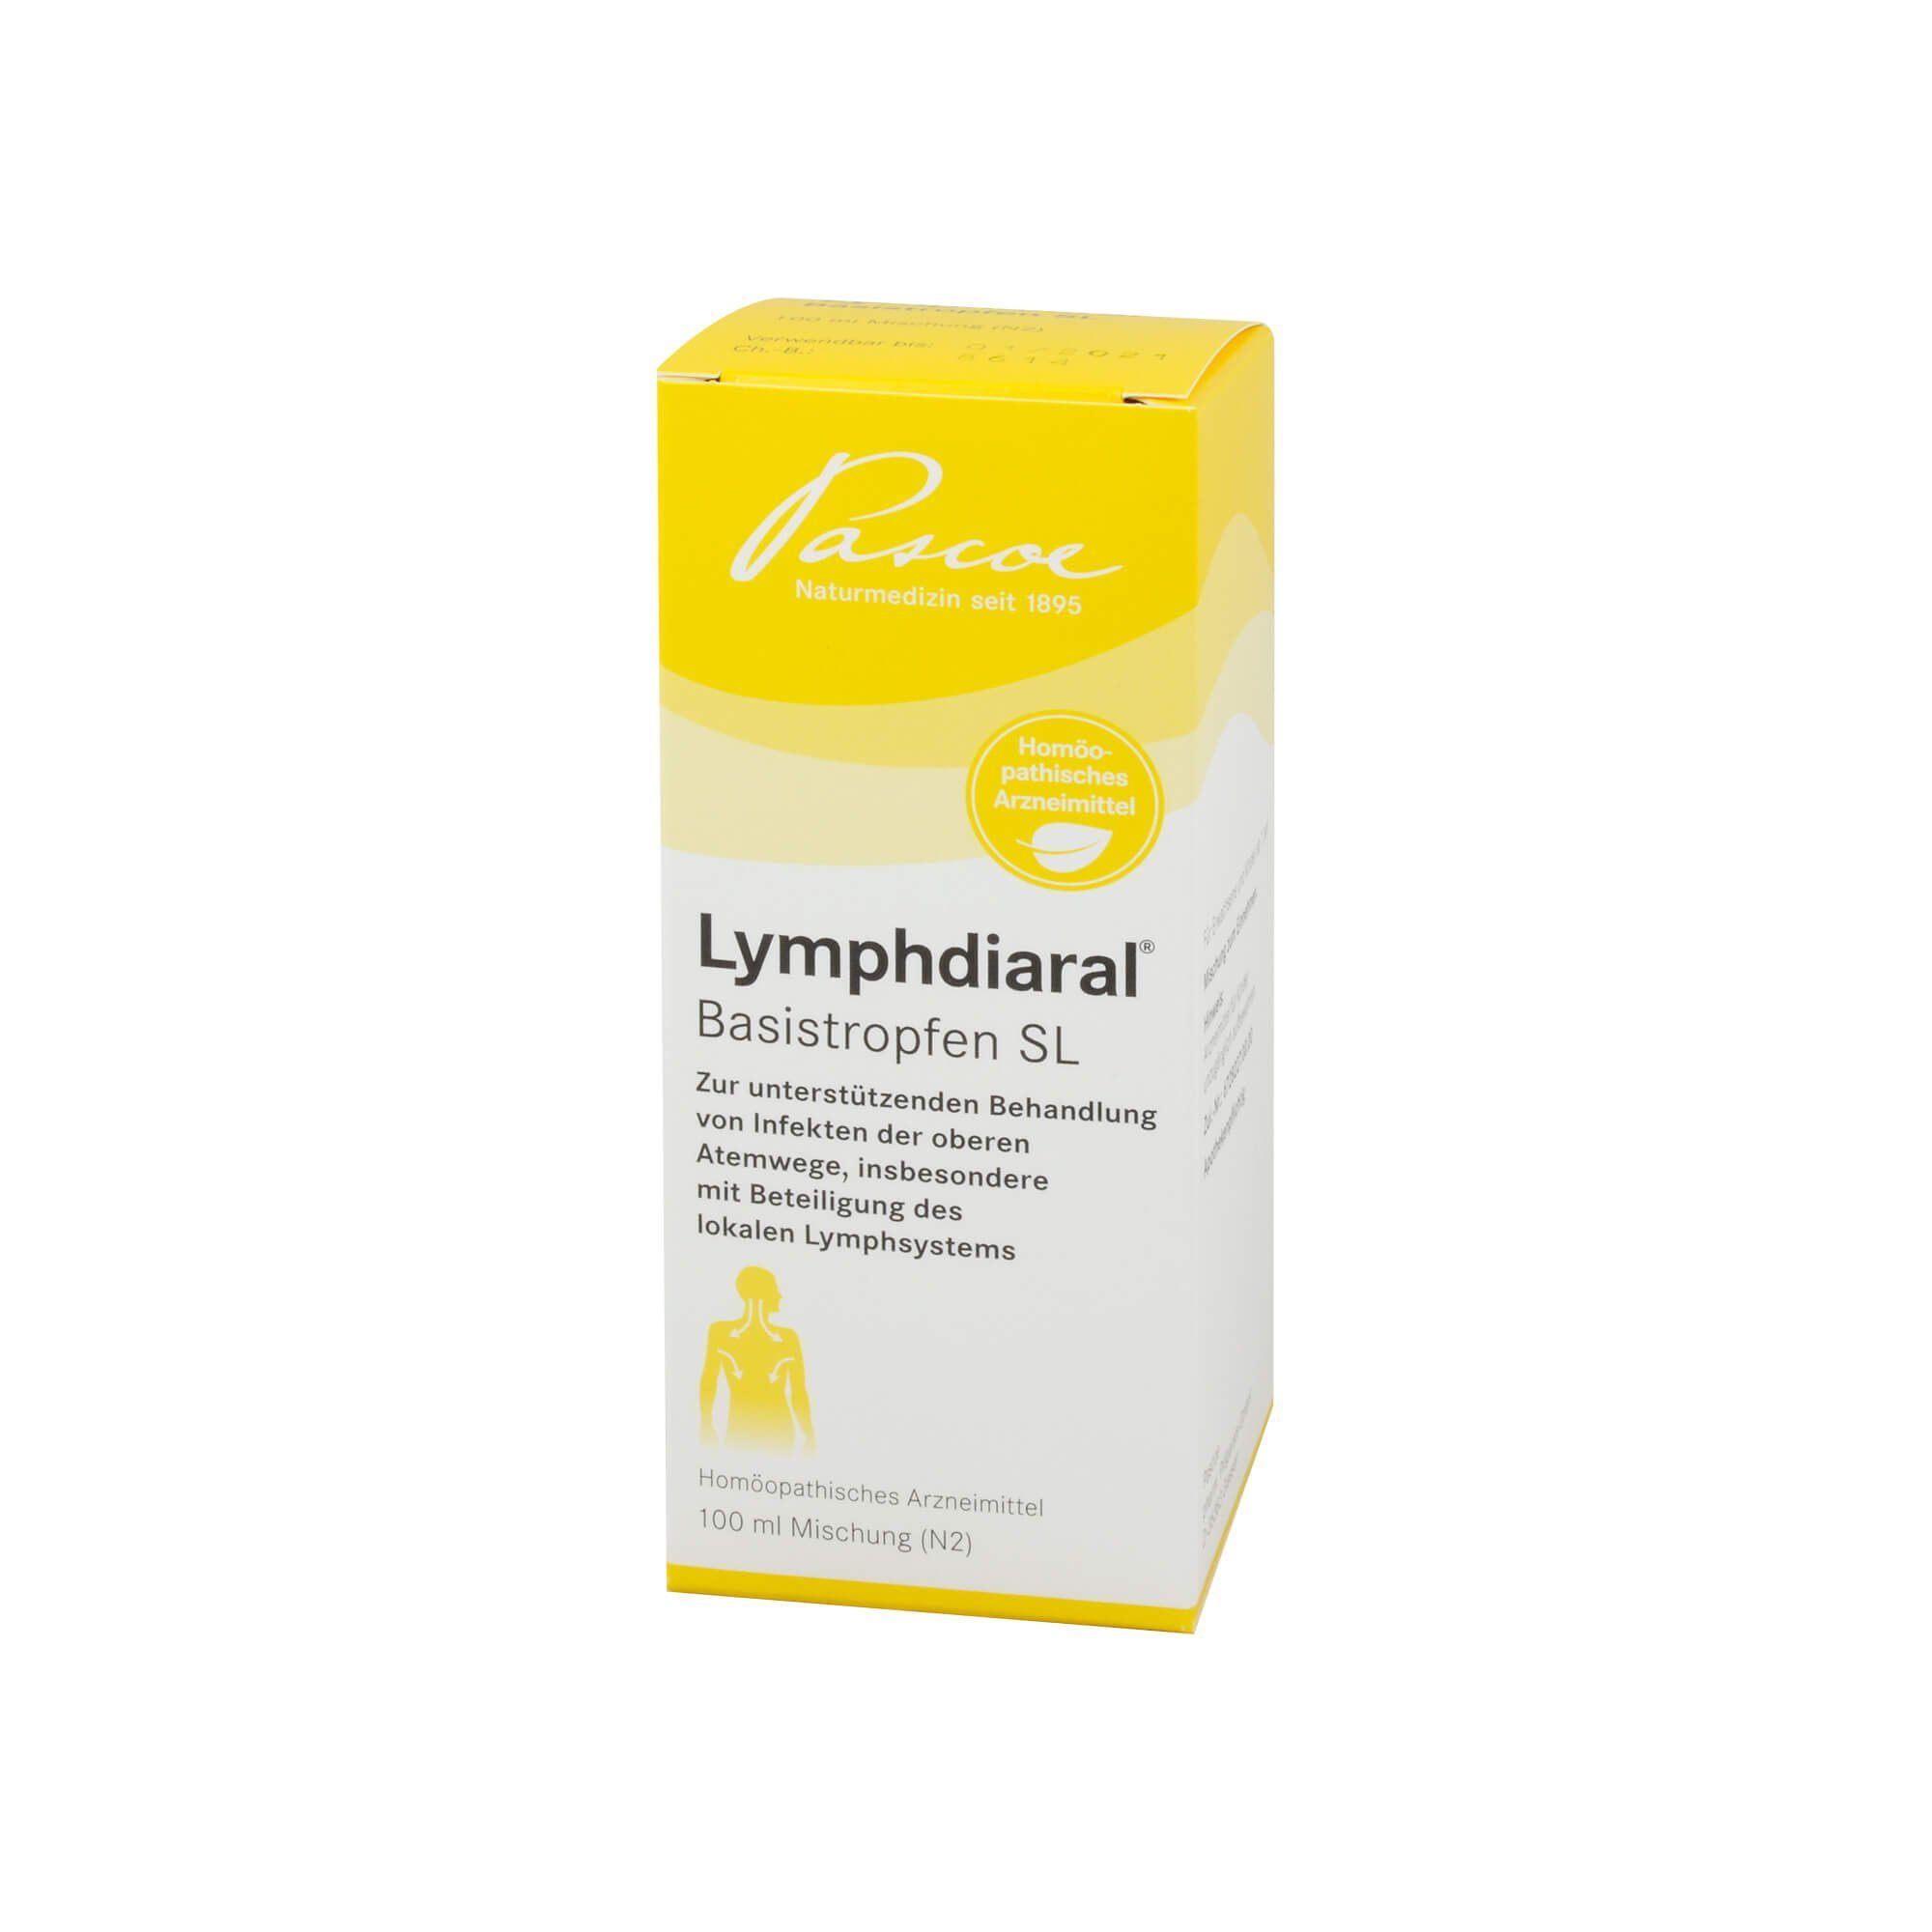 LYMPHDIARAL BASISTROPFEN SL, 100 ml